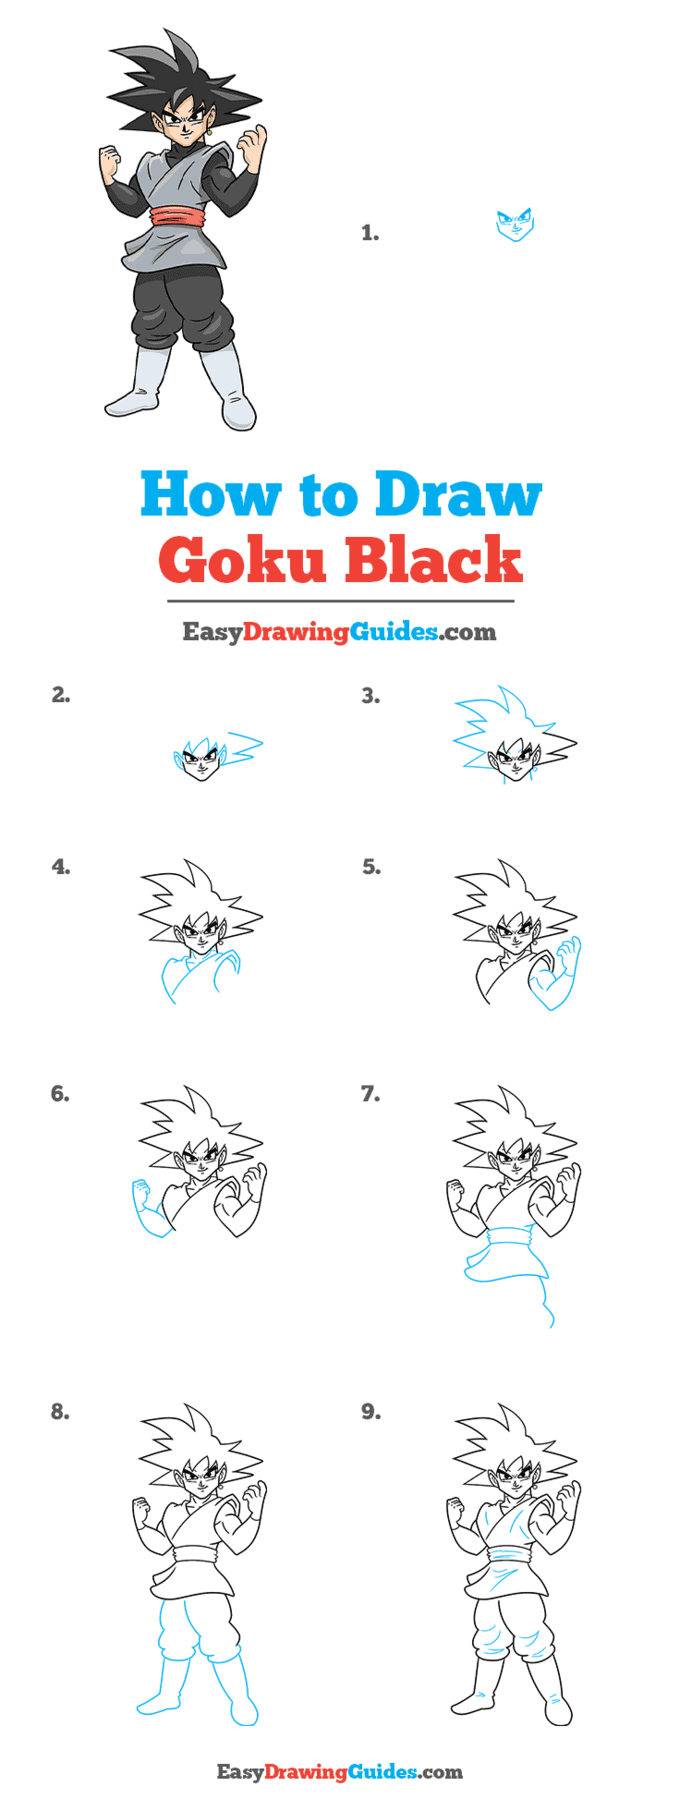 How to Draw Goku Black Step by Step Tutorial Image